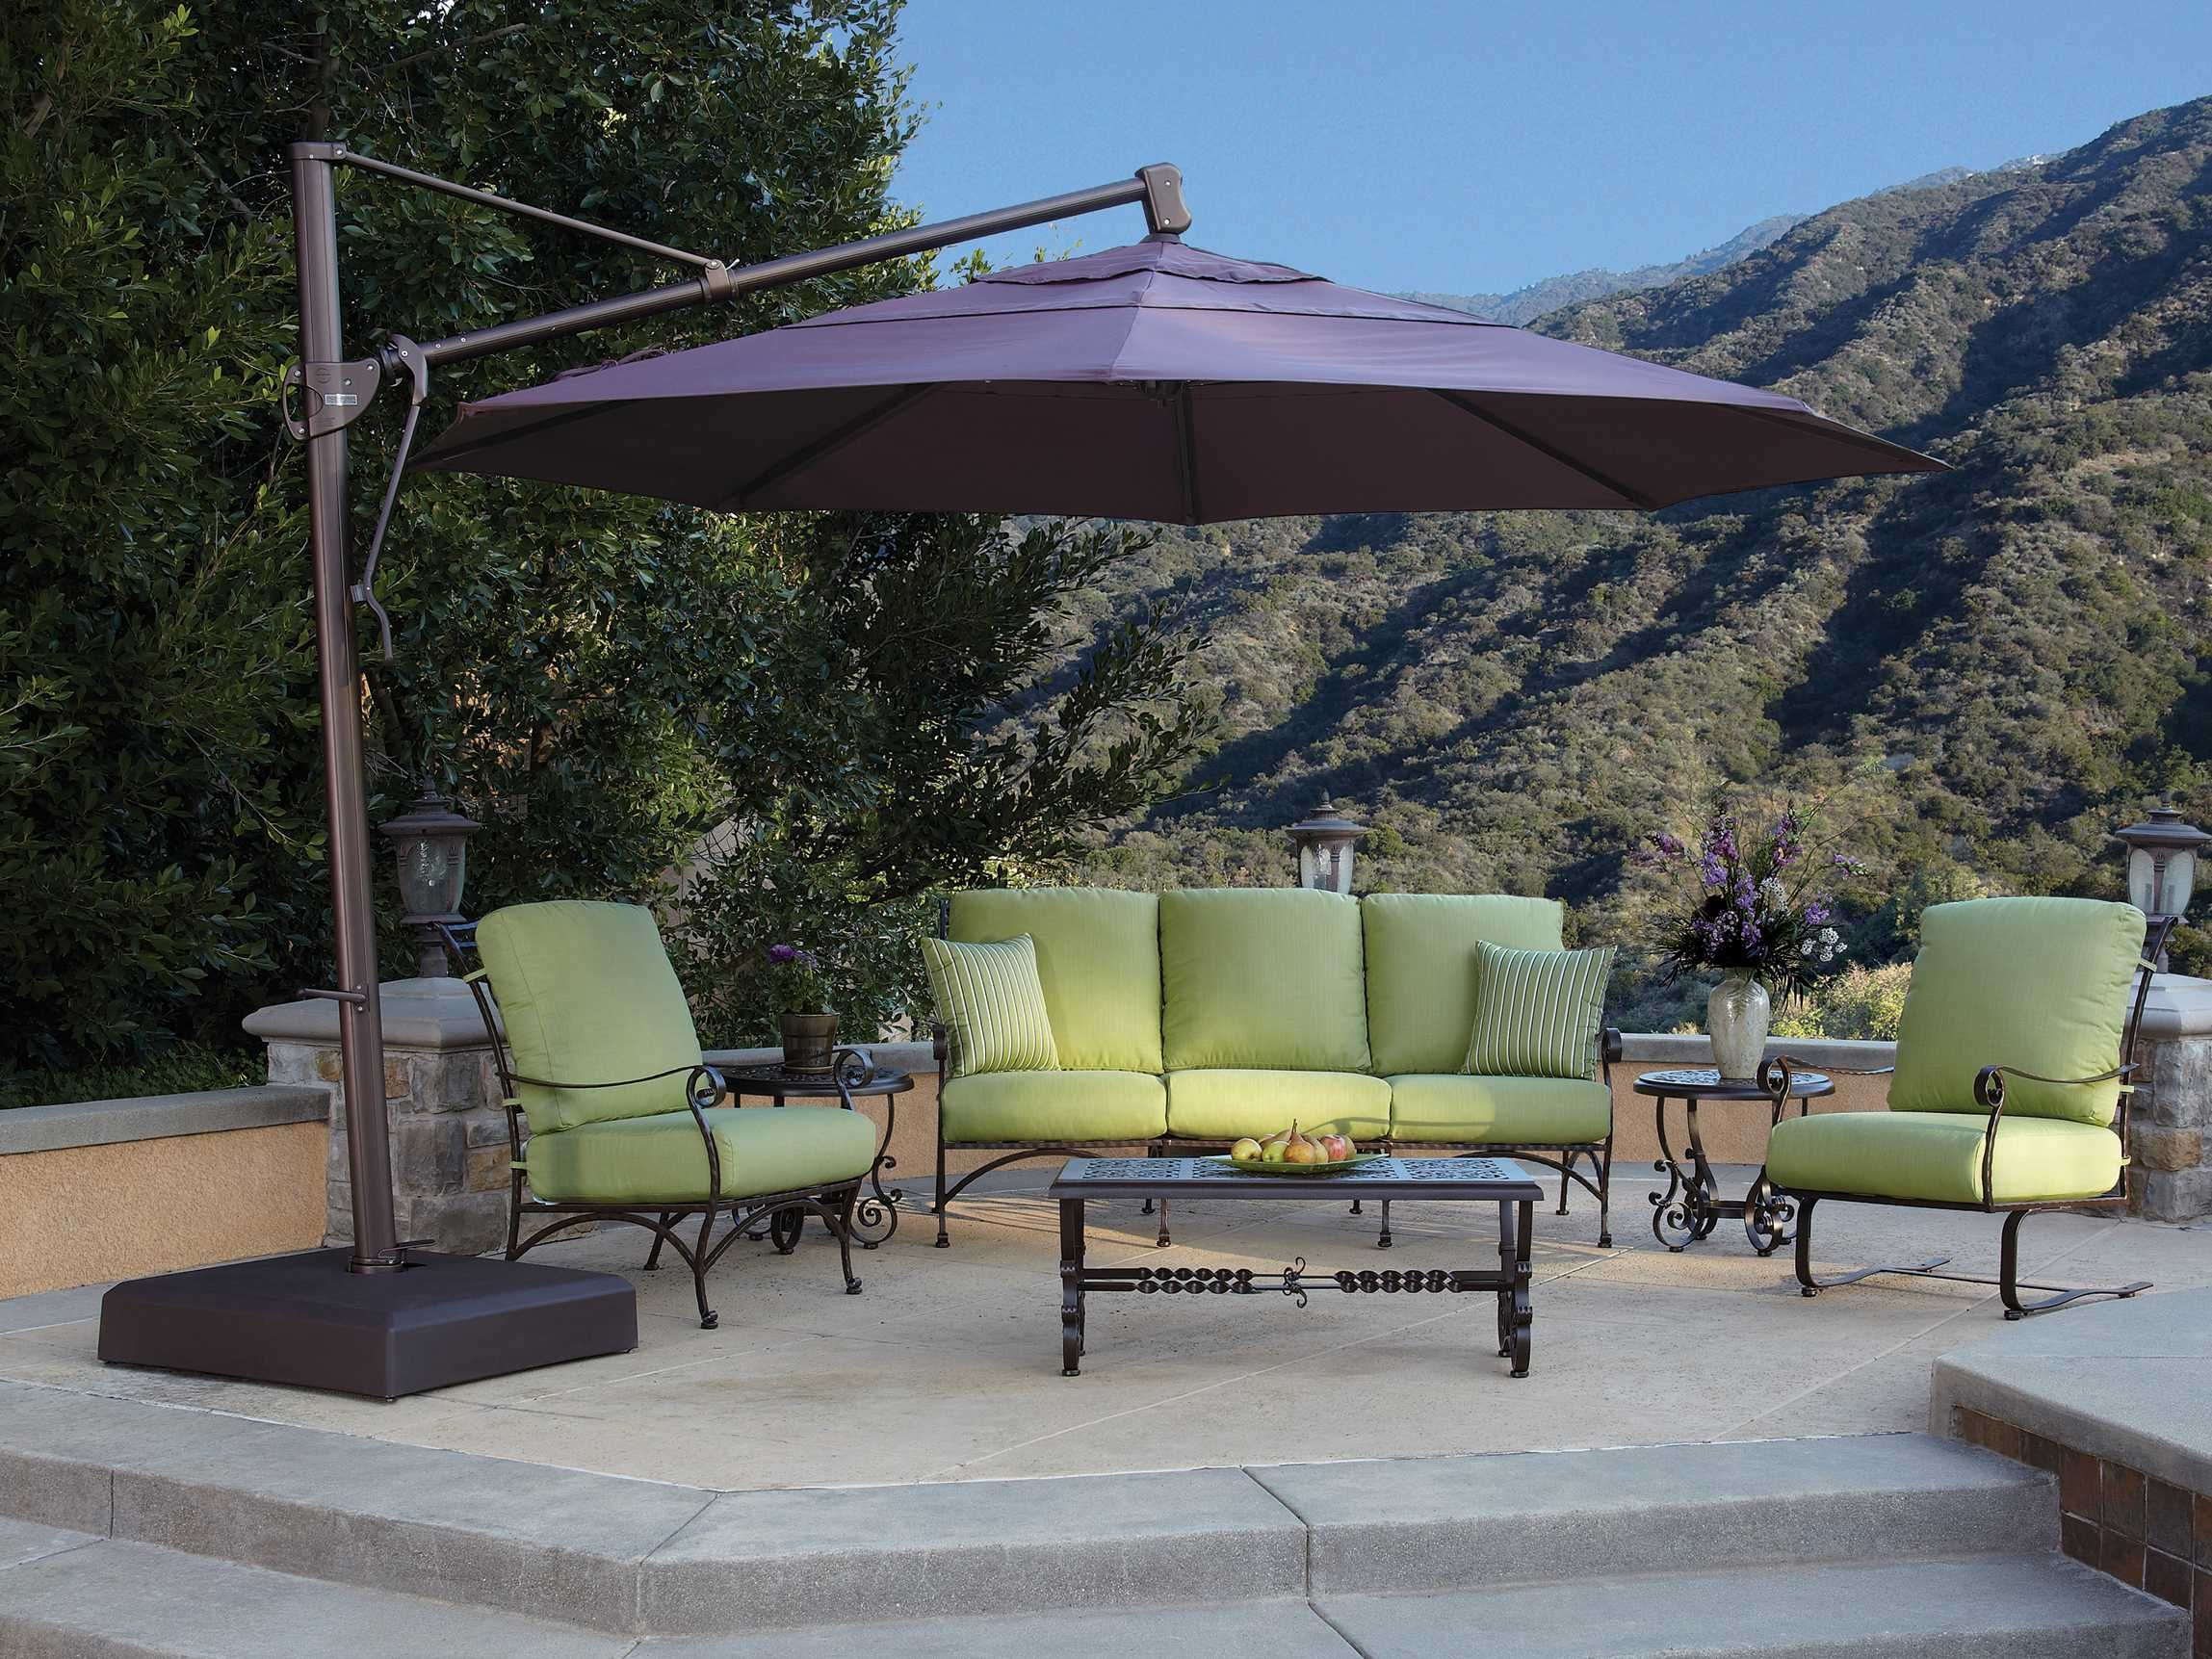 Treasure Garden Umbrella Sale Offset Cantilever Umbrellas Patio Umbrellas Patio Outdoor Garden Furniture